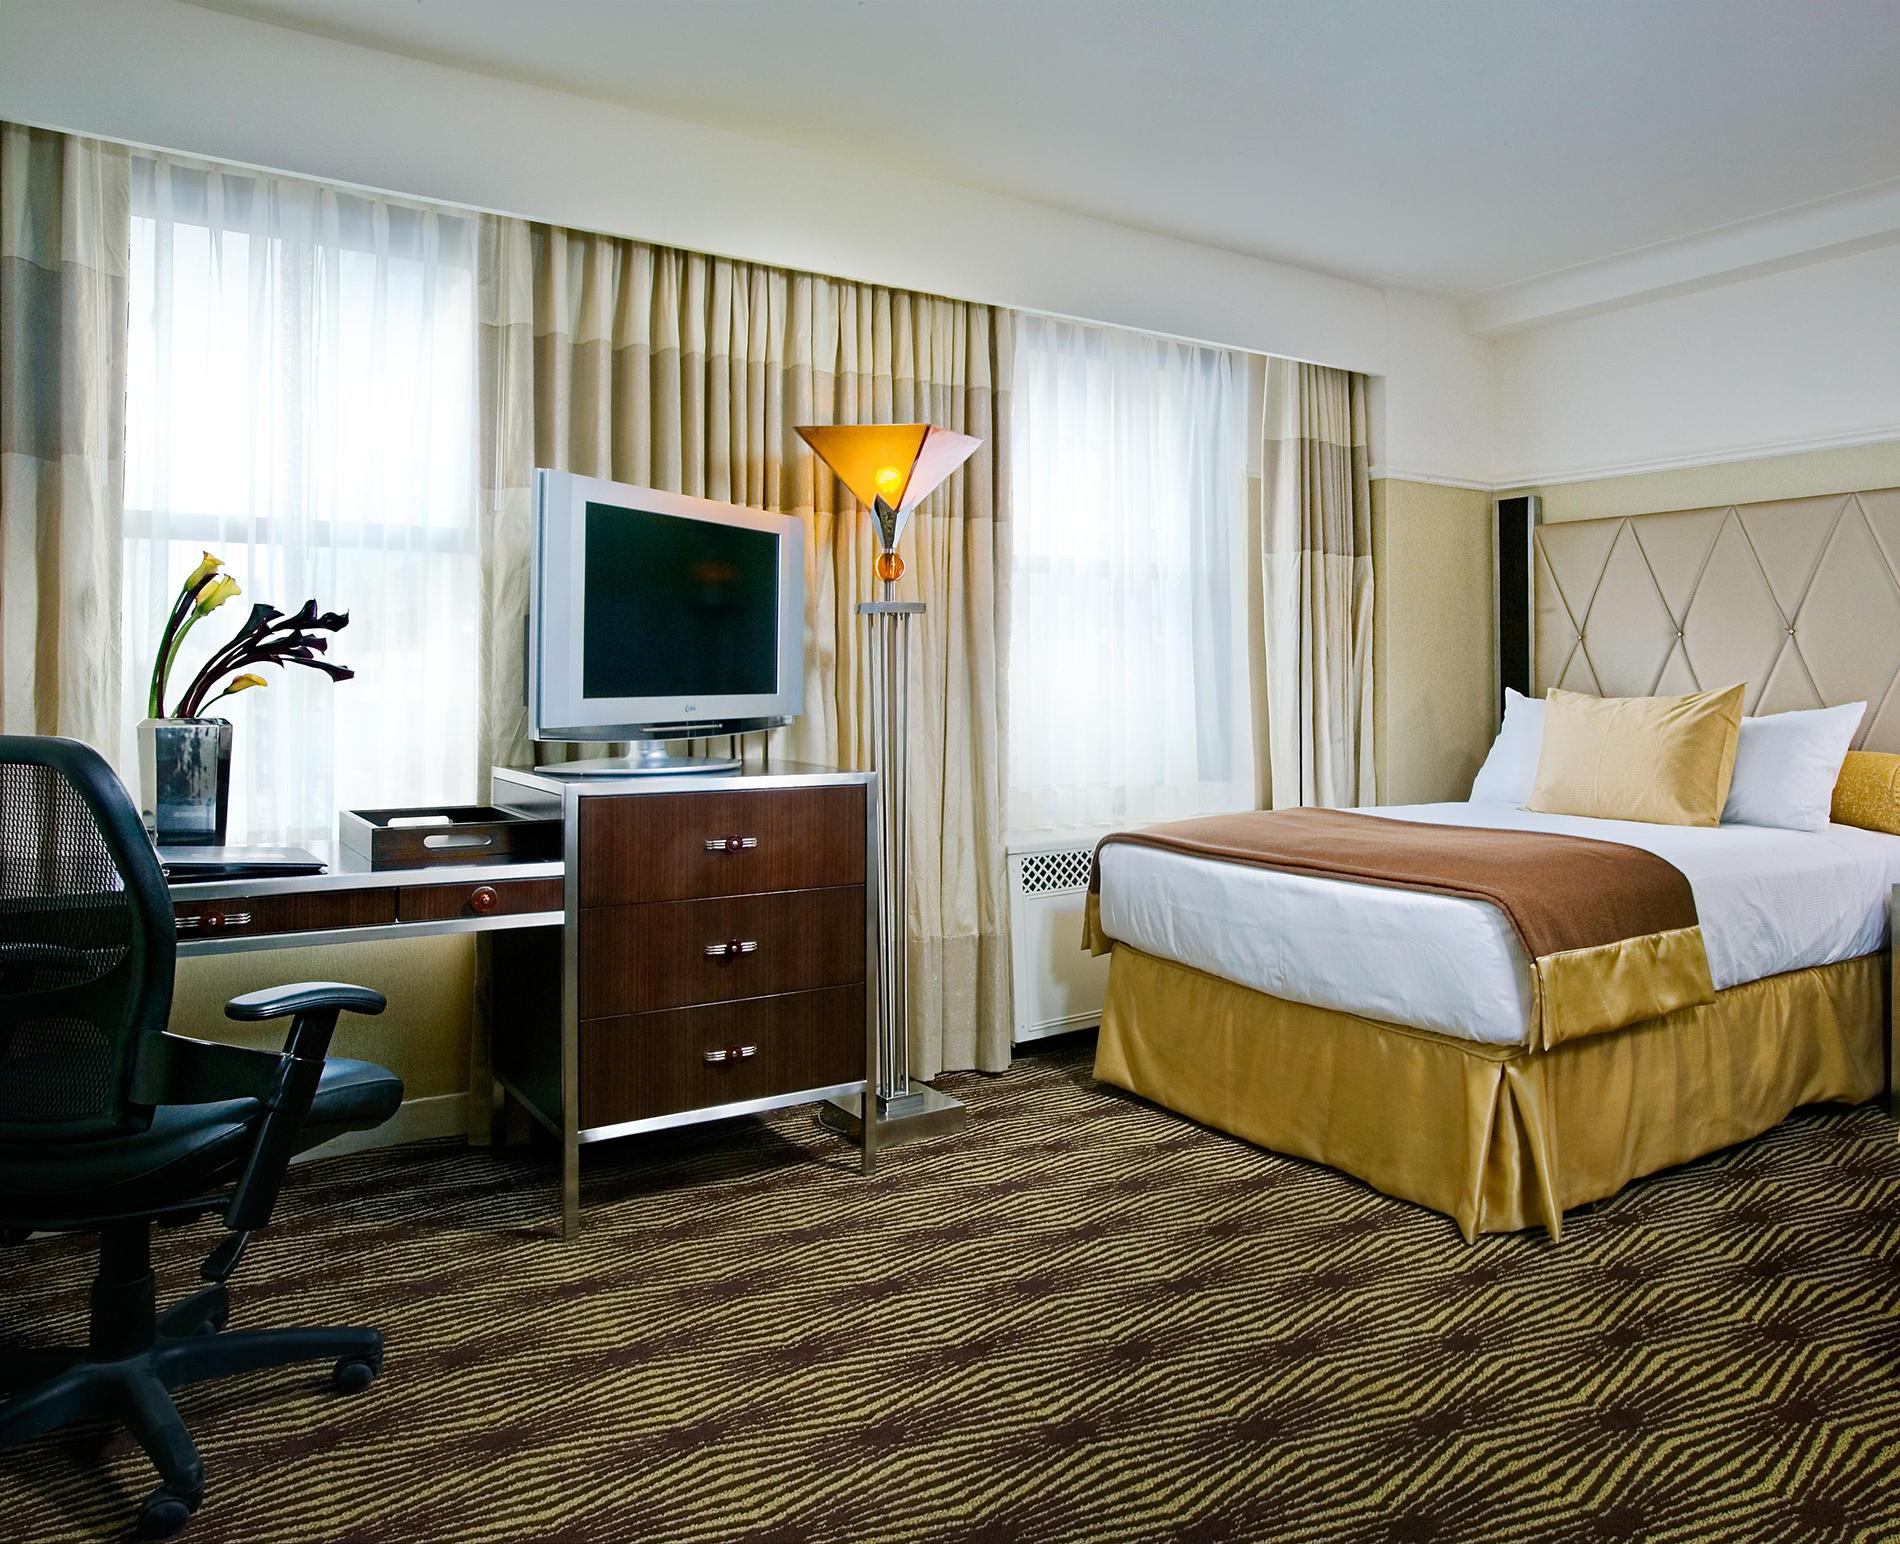 Hotels in Riverside   Rooms & Suites   Mission Inn Hotel